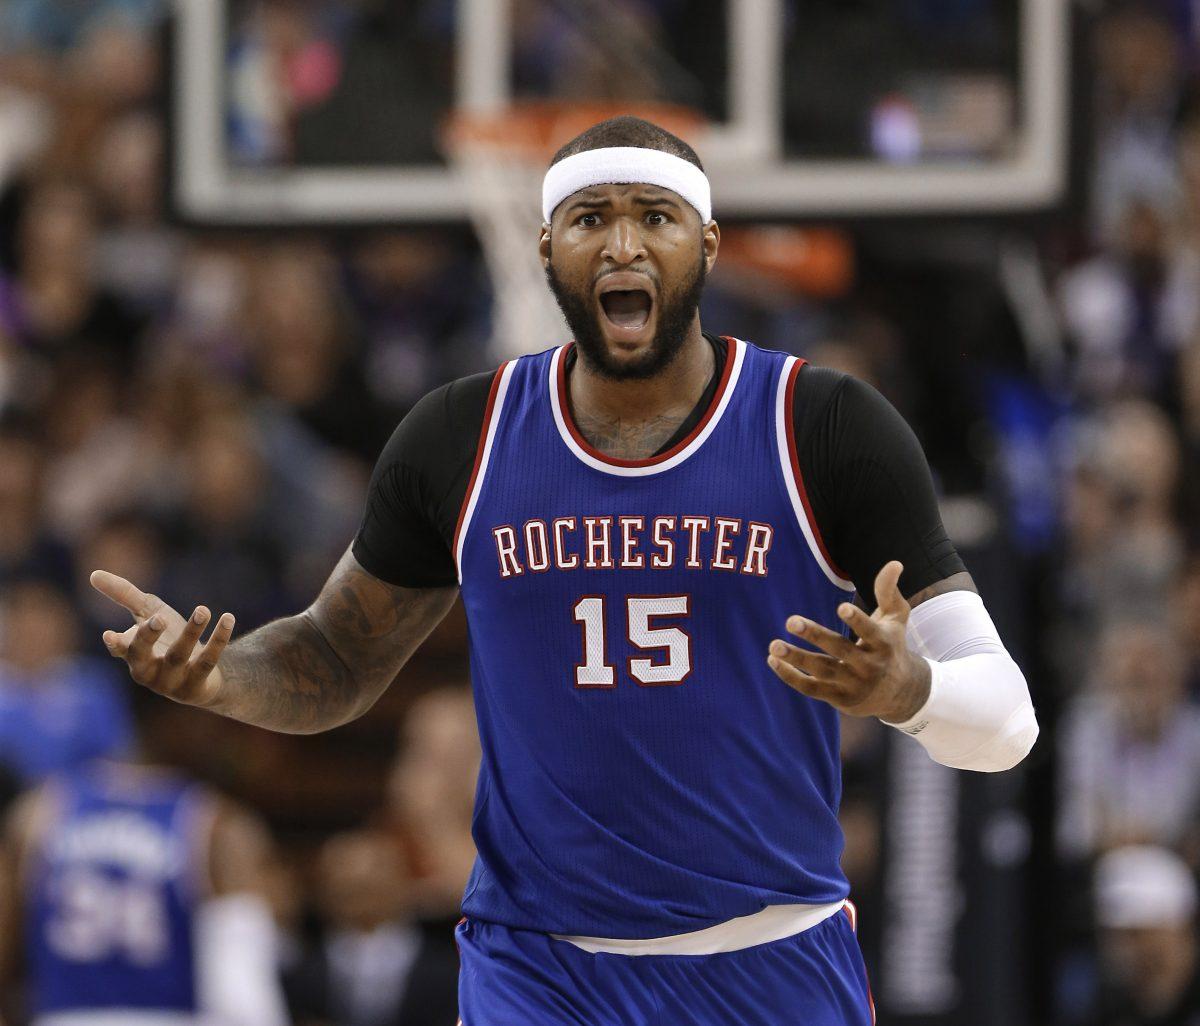 Team Names In The Nba How They Got That Way Atlanta Hawks Boston Celtics Denver Nuggets